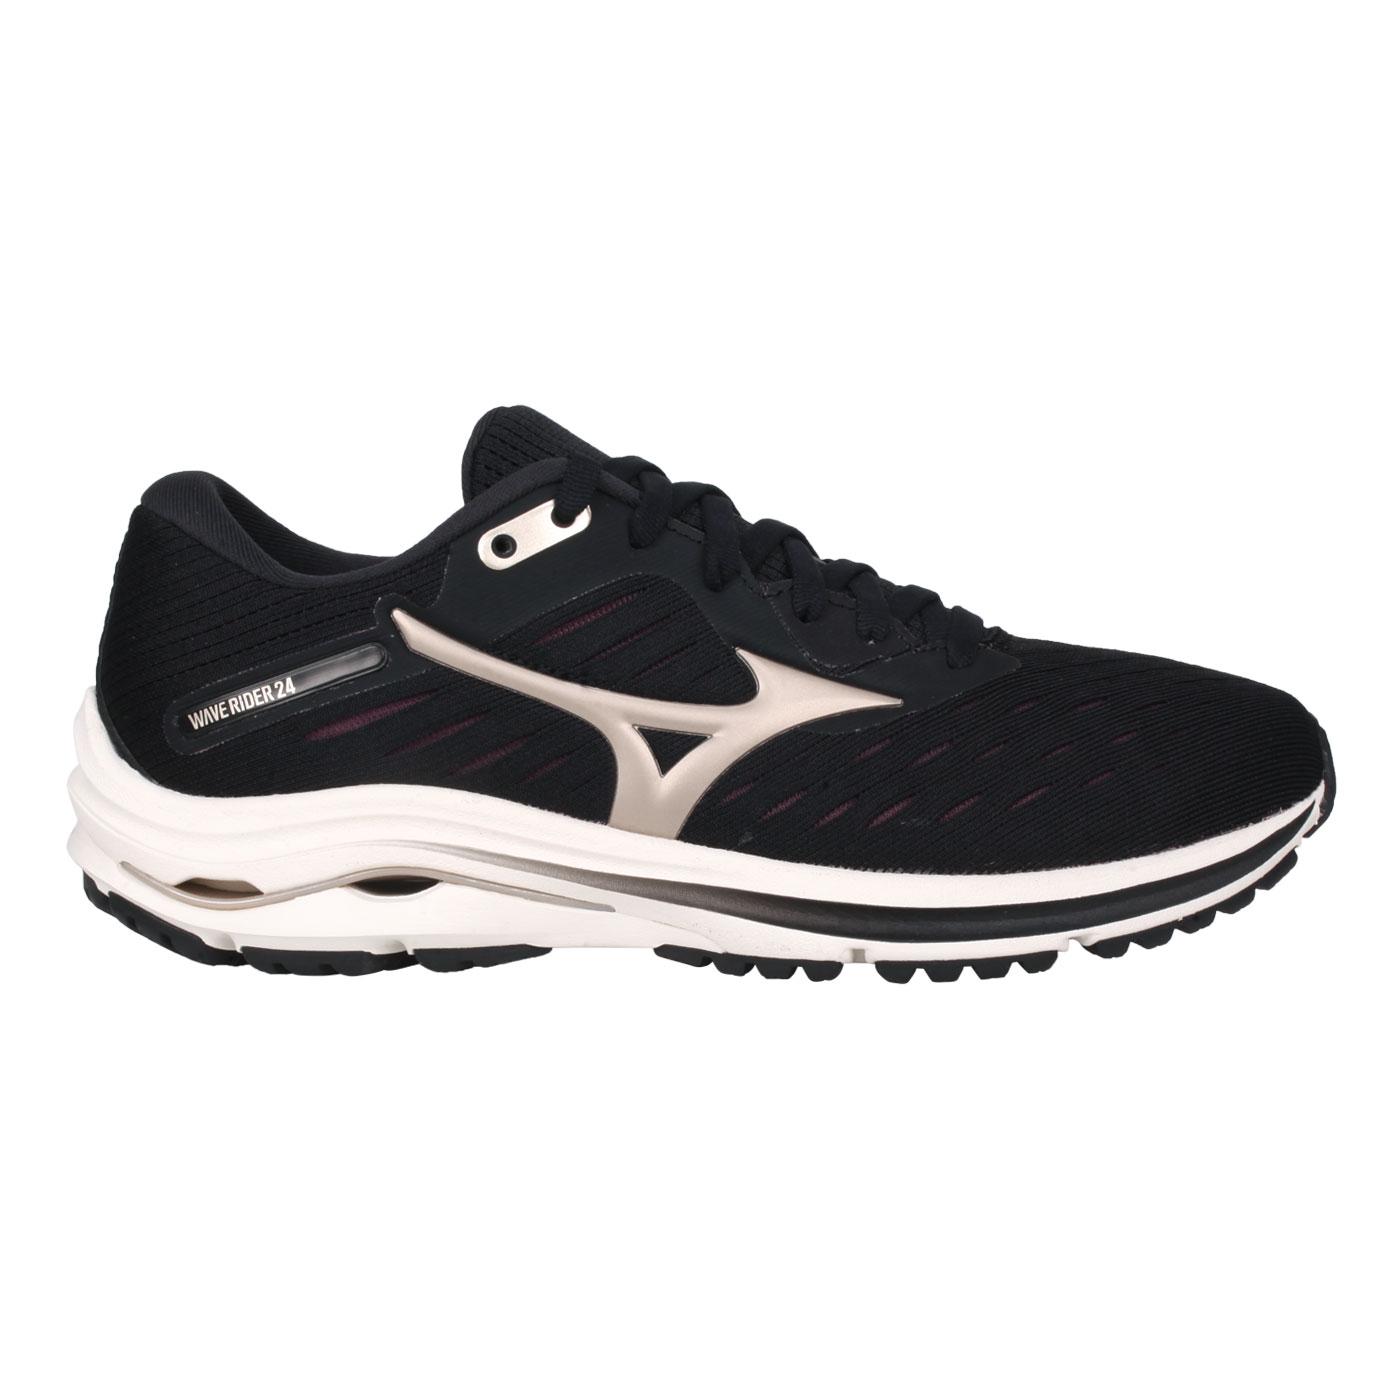 MIZUNO 女款慢跑鞋  @WAVE RIDER 24@J1GD200342 - 黑香檳金